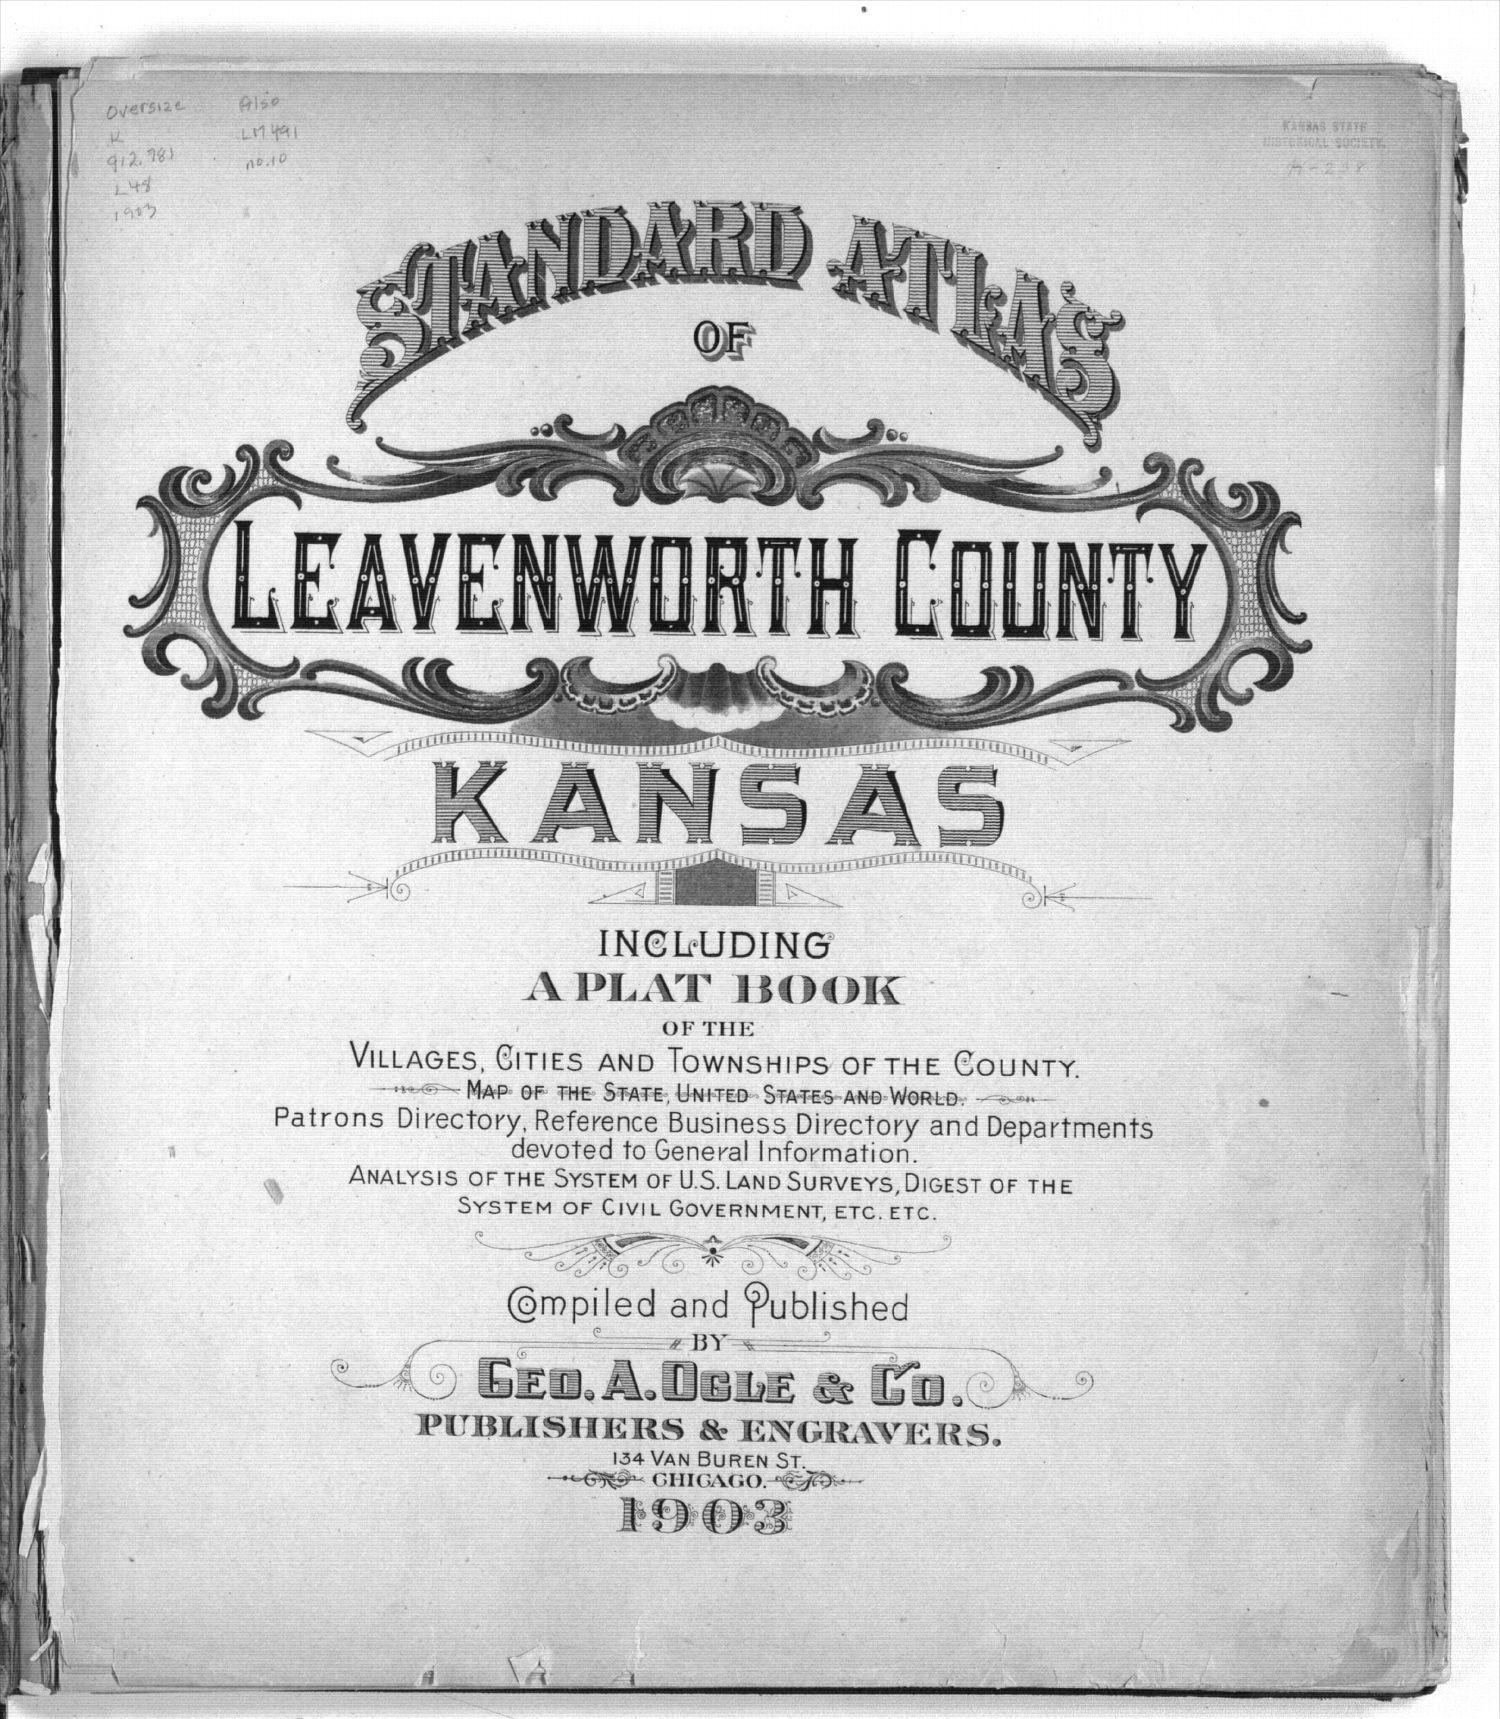 Standard atlas of Leavenworth County, Kansas - Title Page